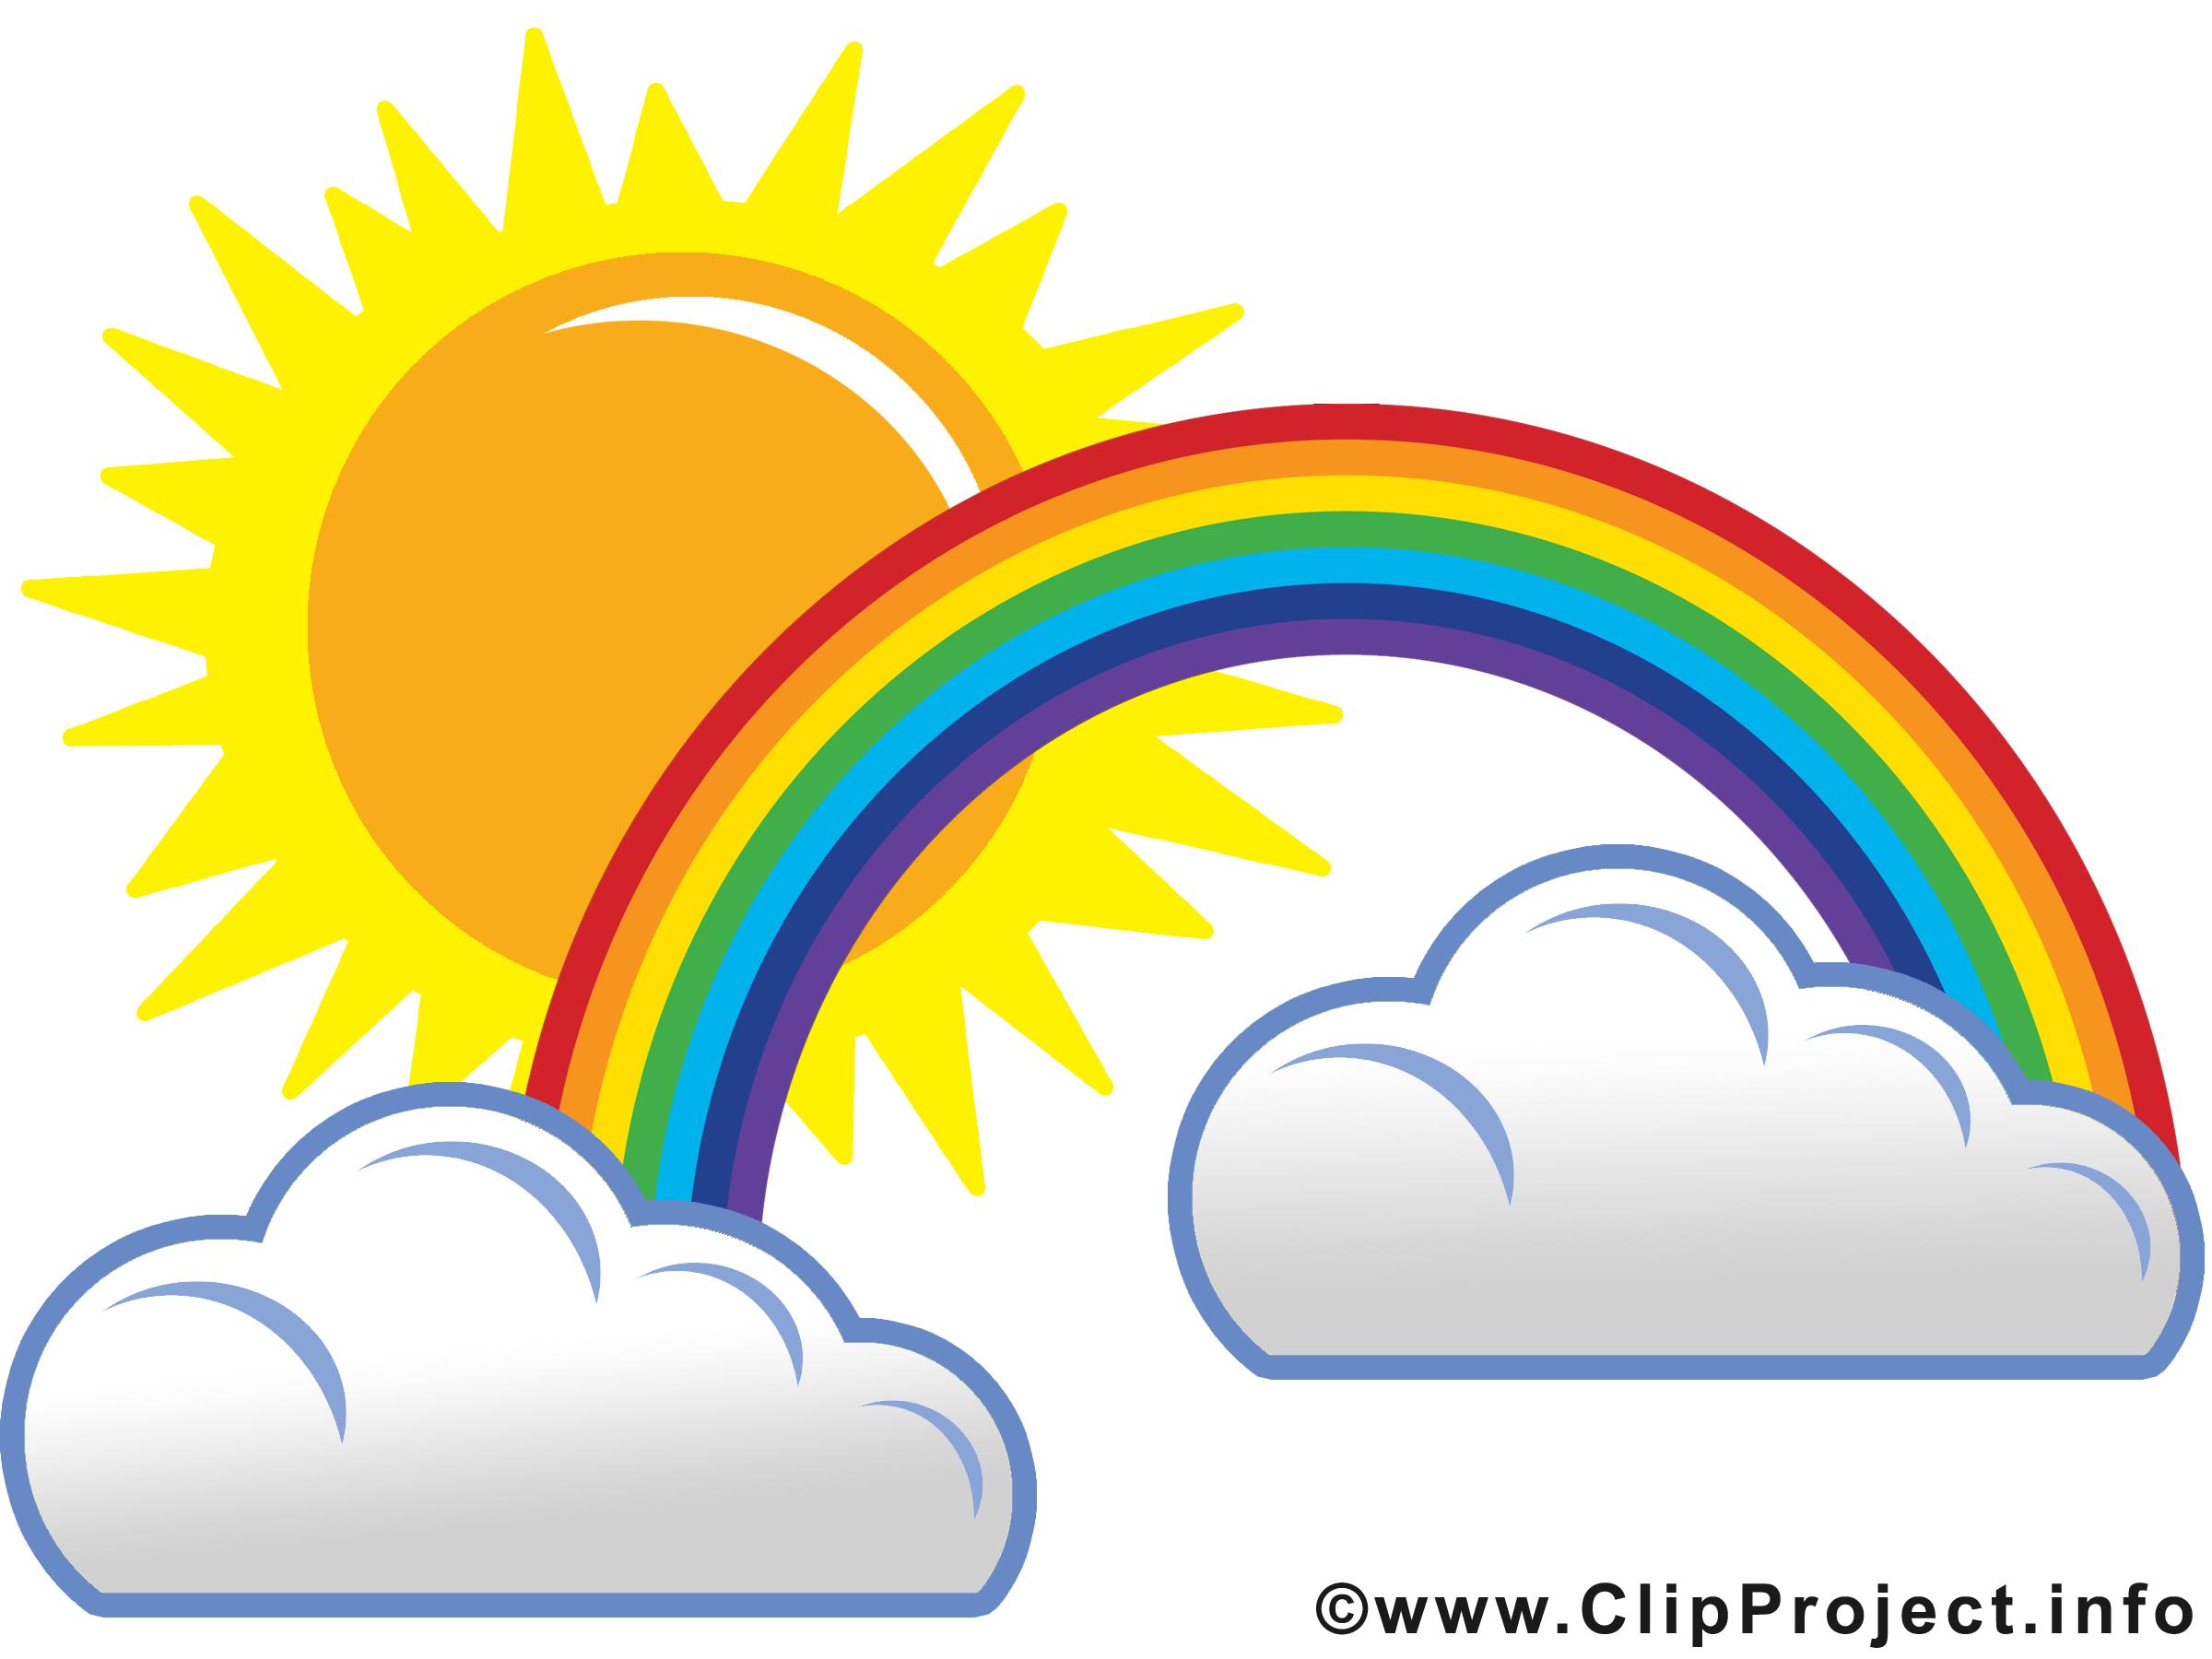 Regenbogen clipart kostenlos.